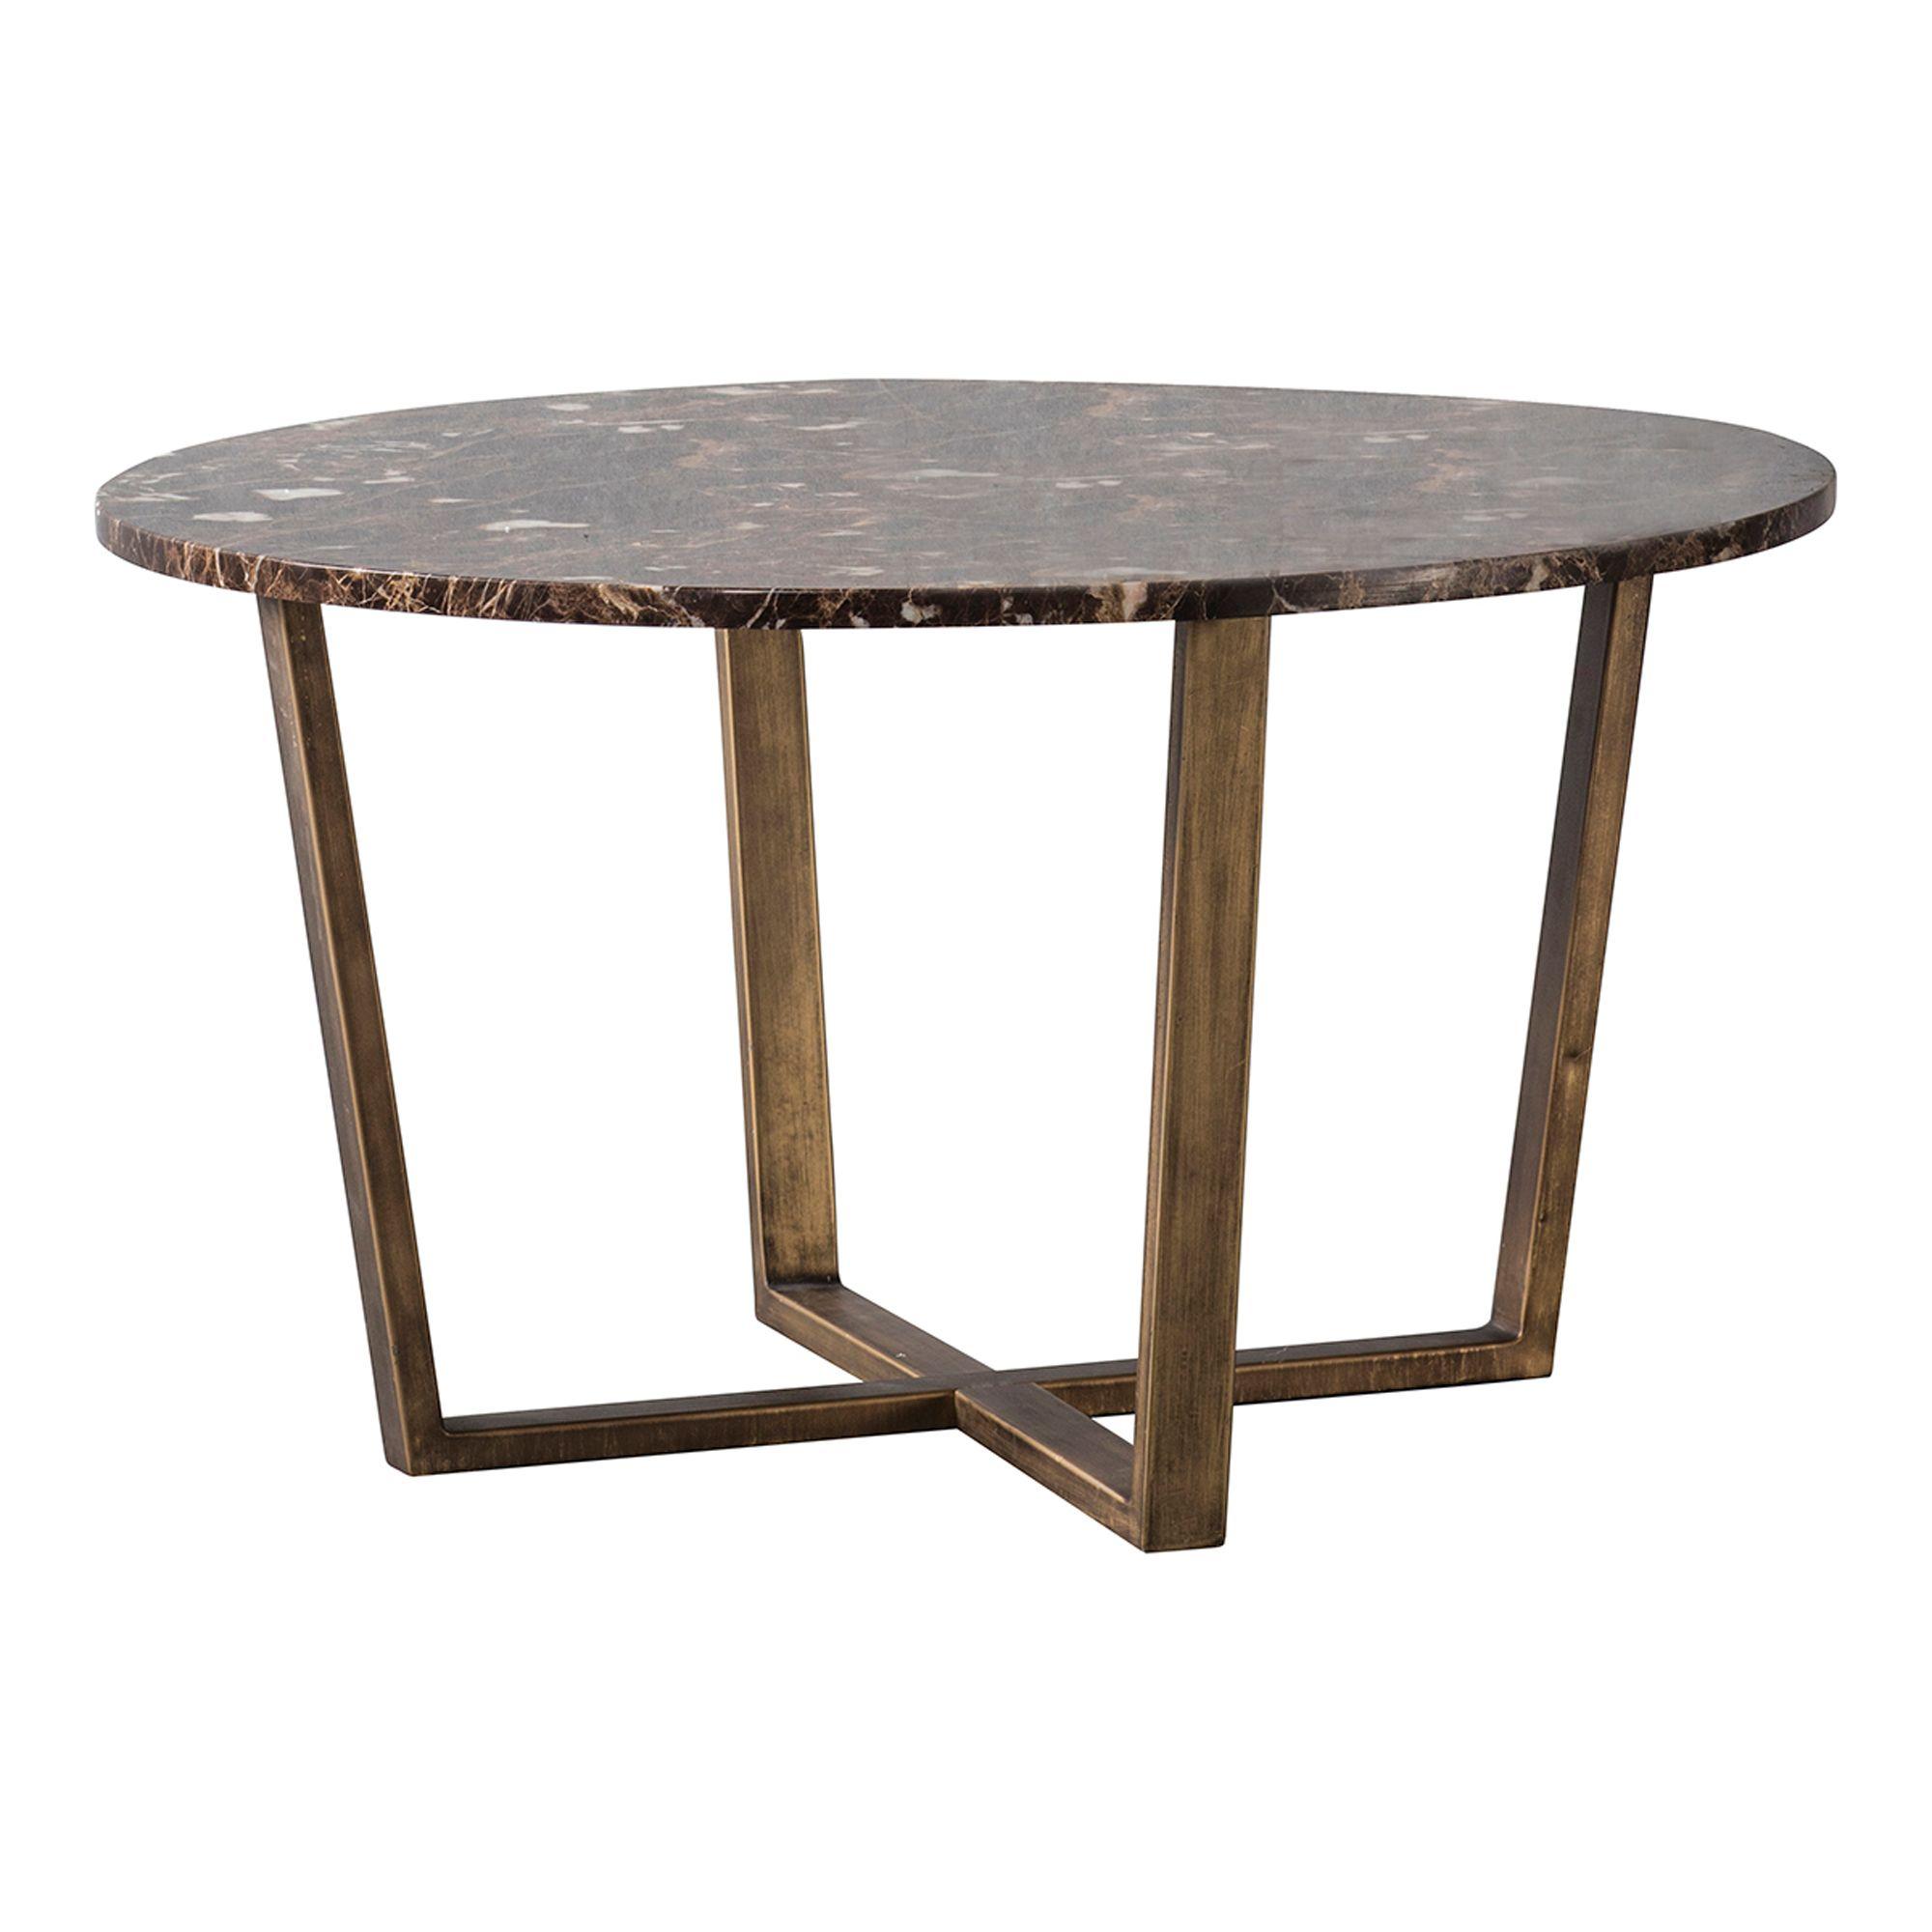 Nala Round Marble Coffee Table Marble Round Coffee Table Marble Coffee Table Unique Coffee Table [ 2000 x 2000 Pixel ]